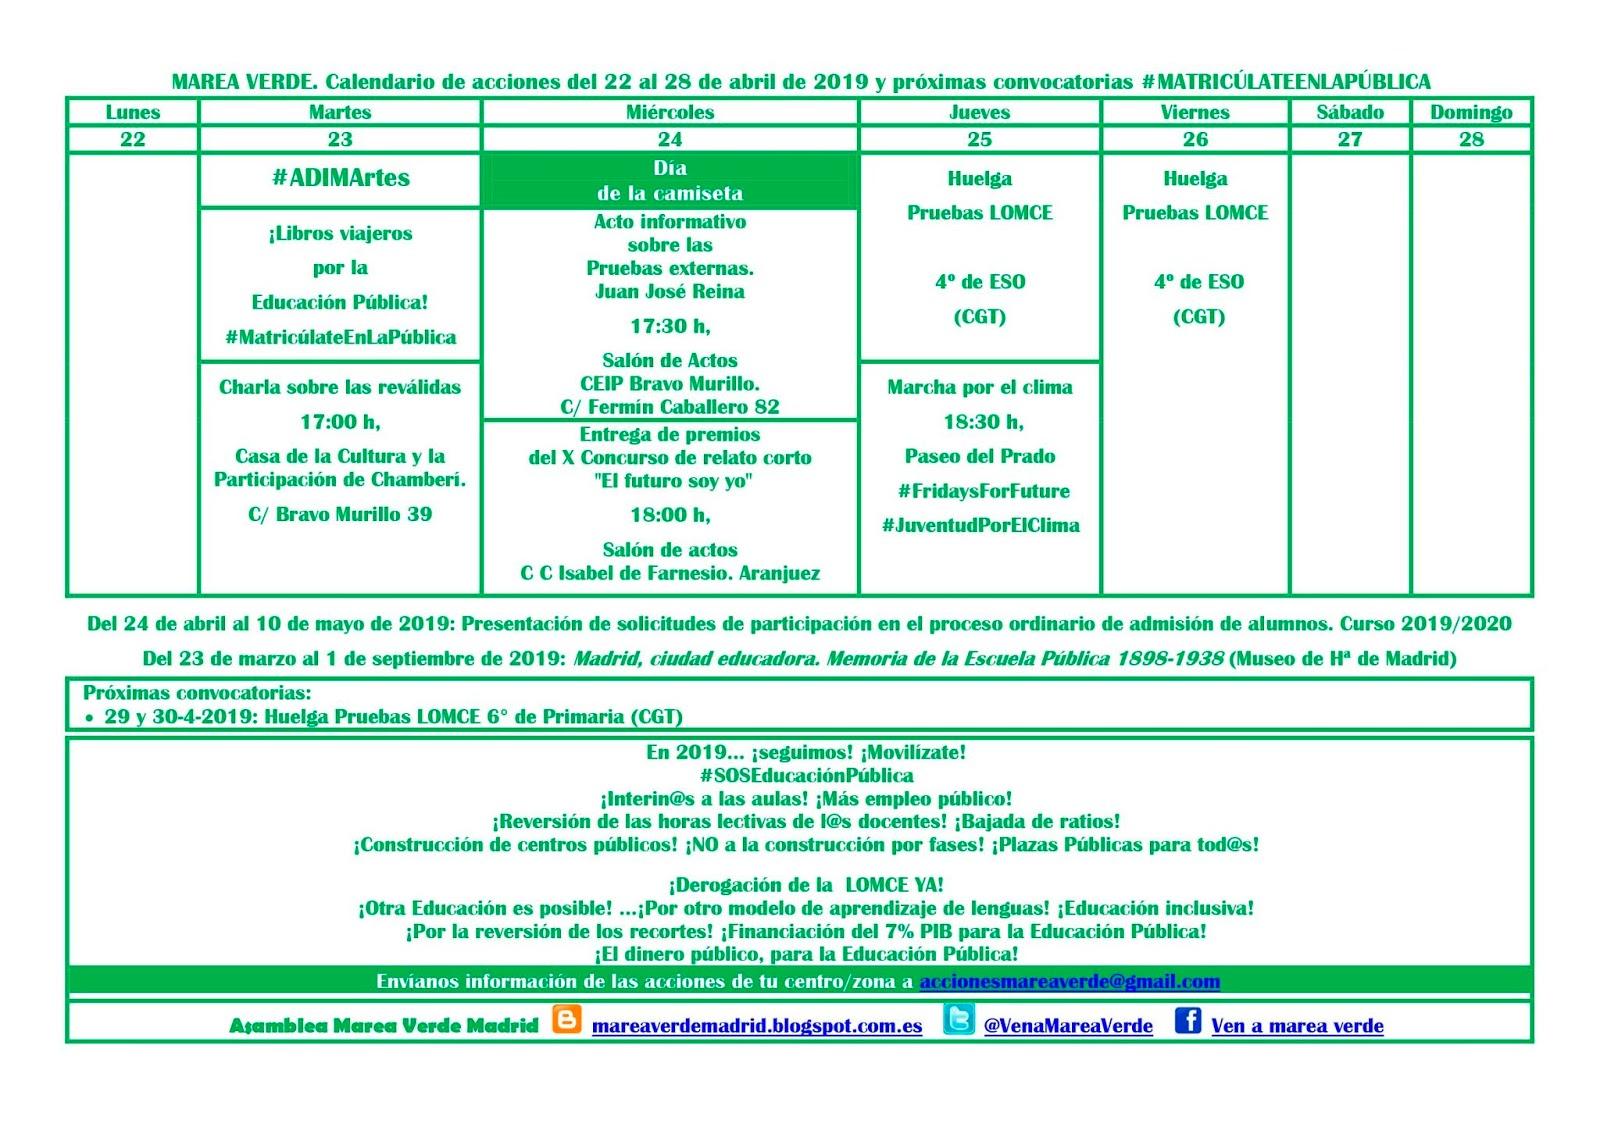 Calendario Ebau 2020 Madrid.Mareaverde Calendario De Acciones Marea Verde Madrid Para